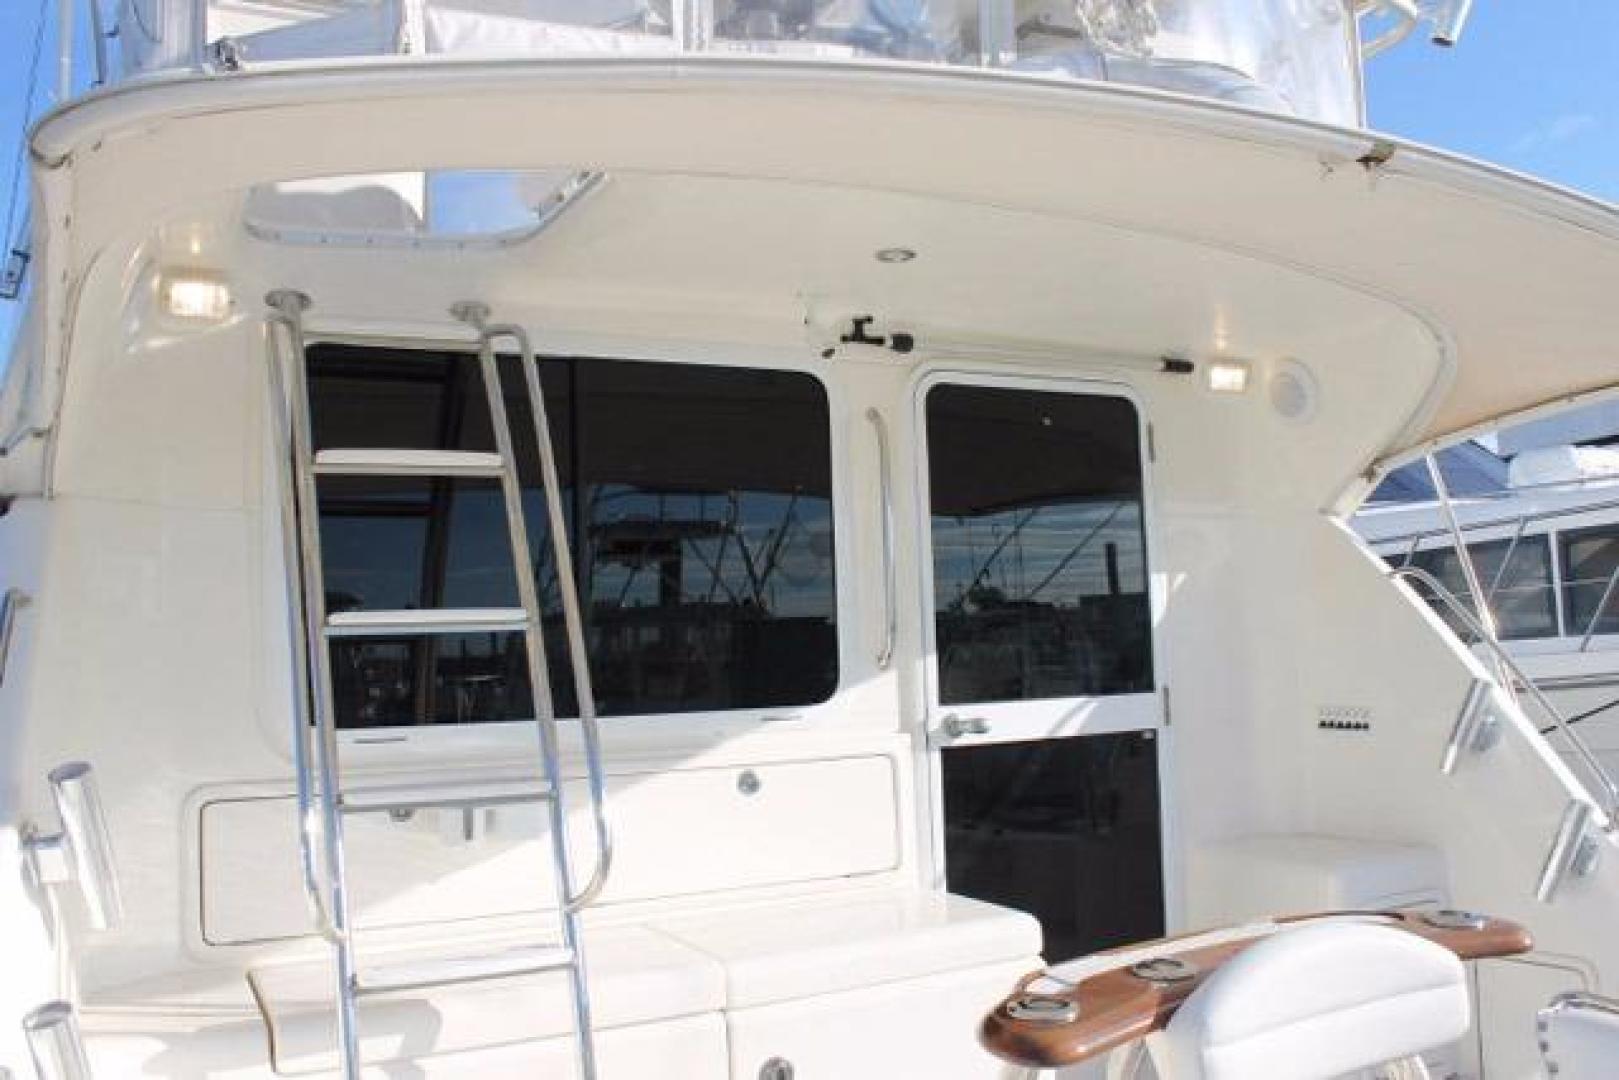 Riviera-Convertible 2008-Dolphin Seeker Wildwood-New Jersey-United States-Bulkhead-928467 | Thumbnail